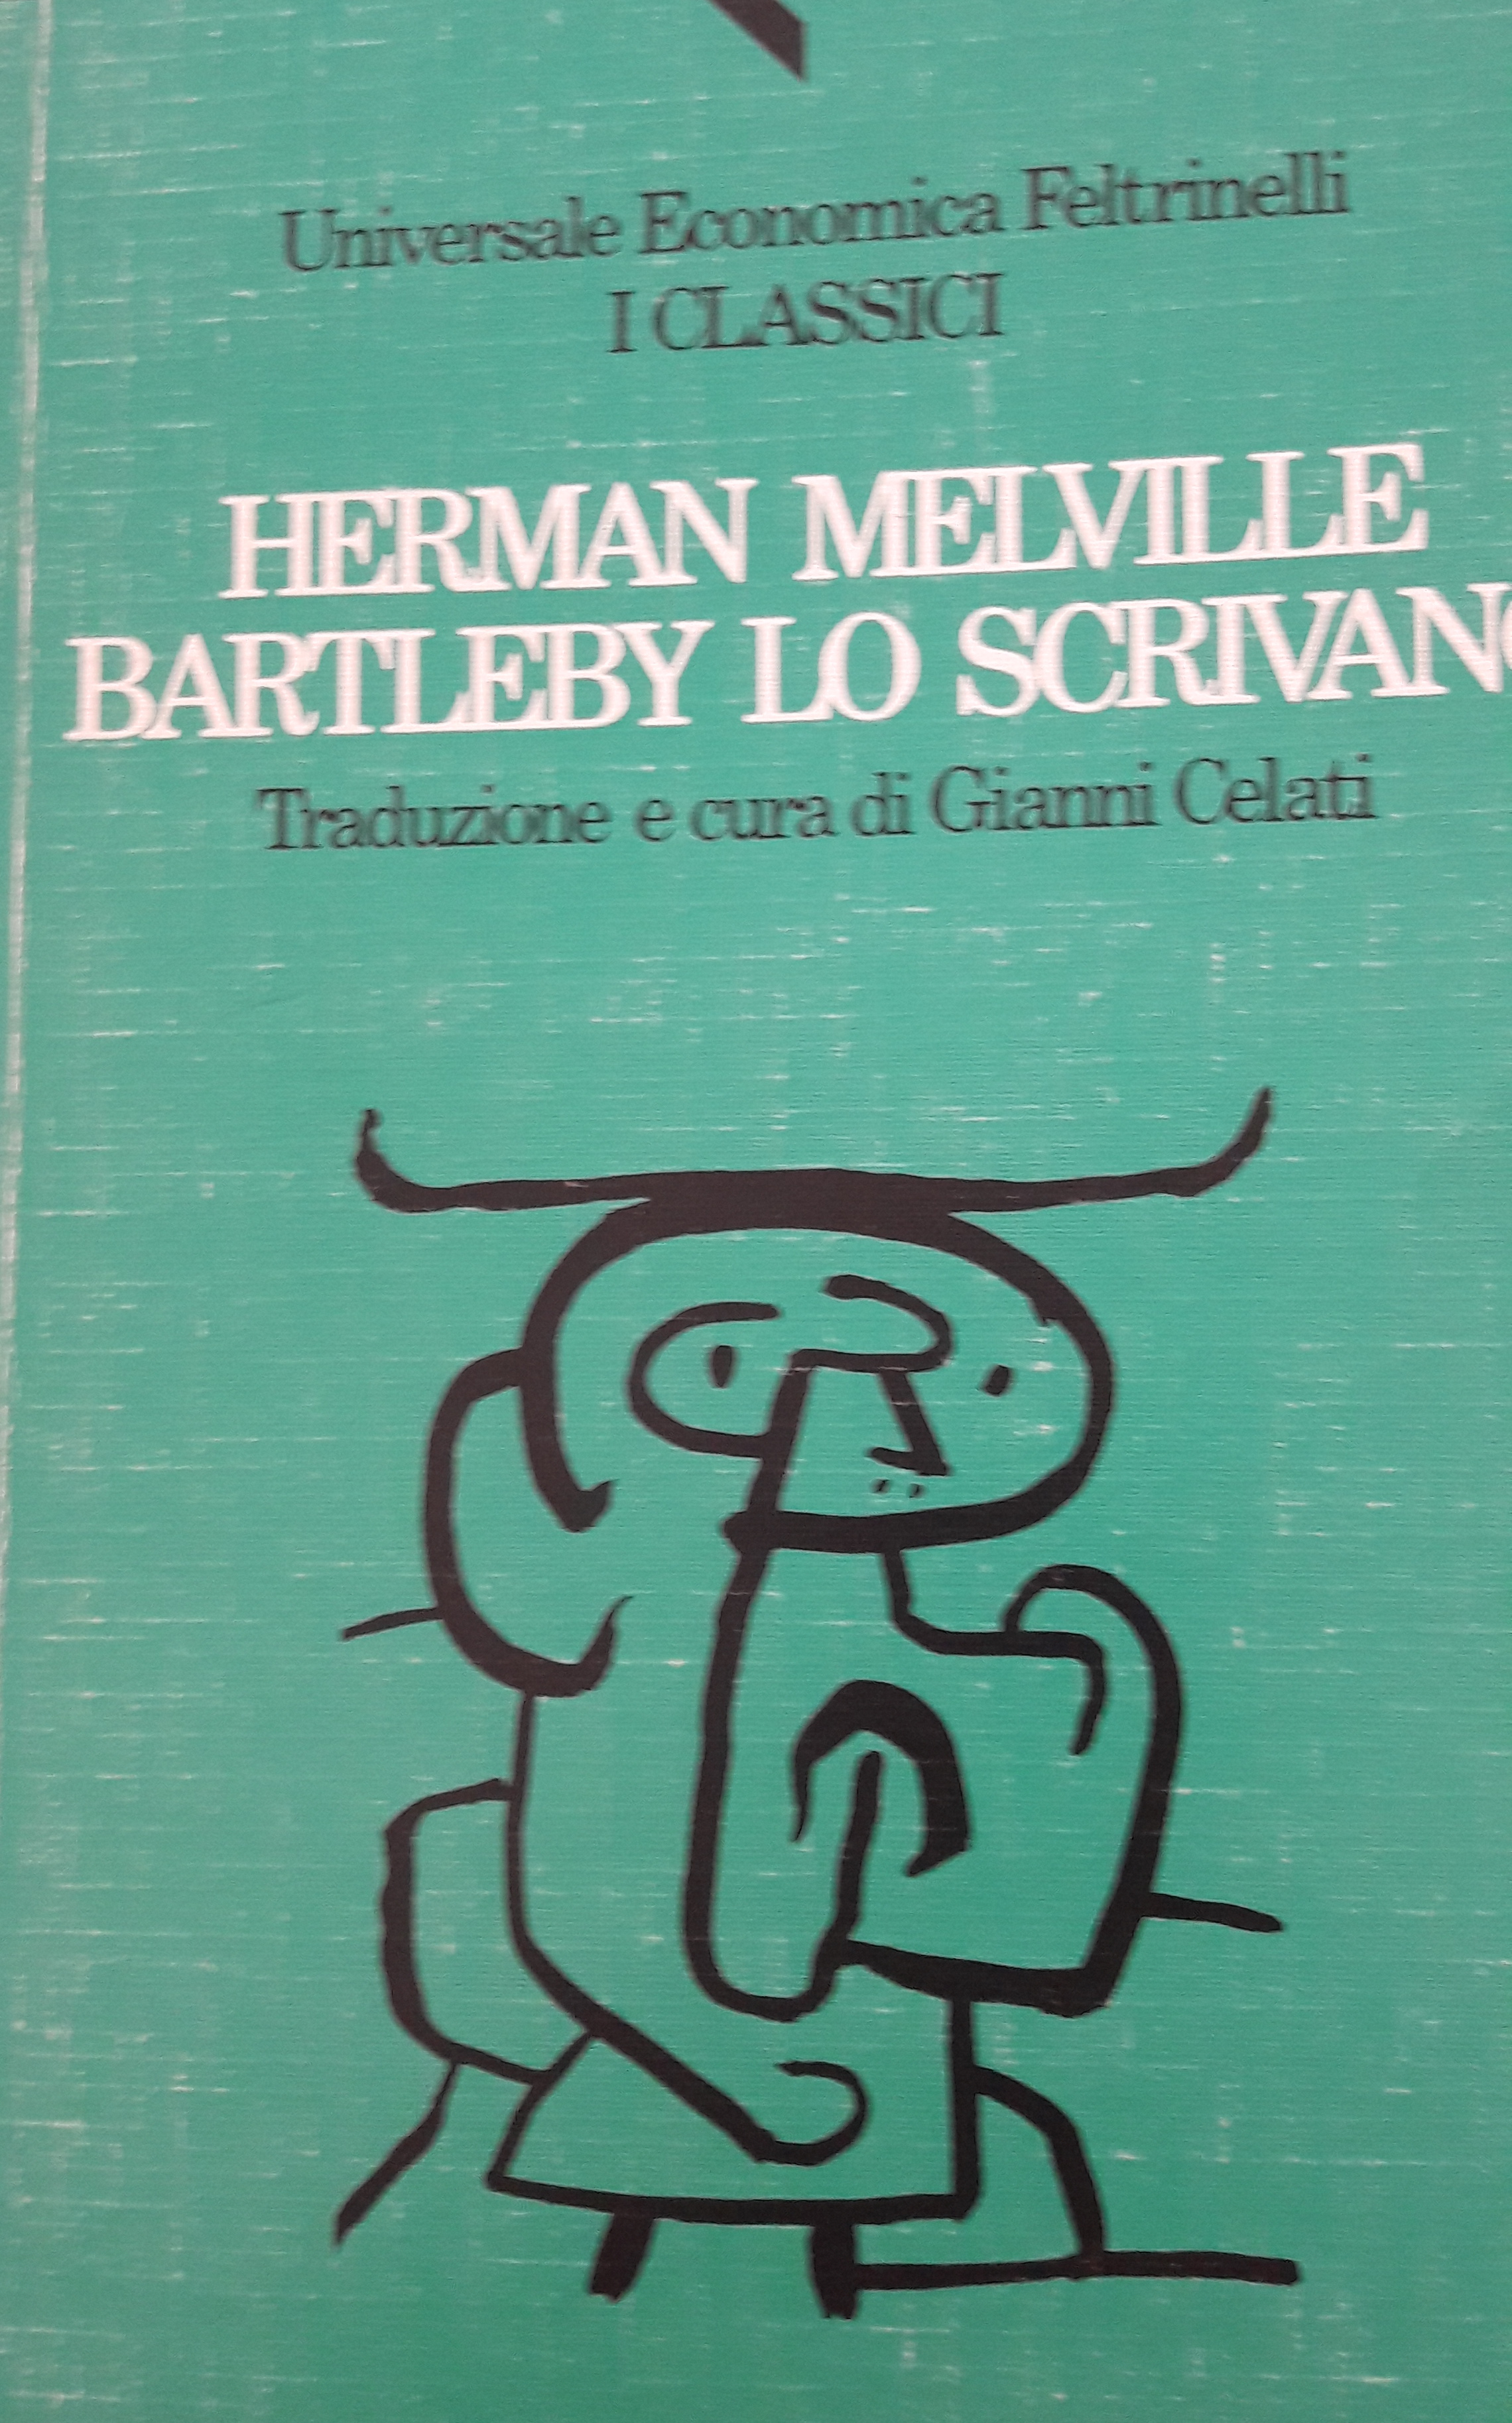 Bartleby Melville